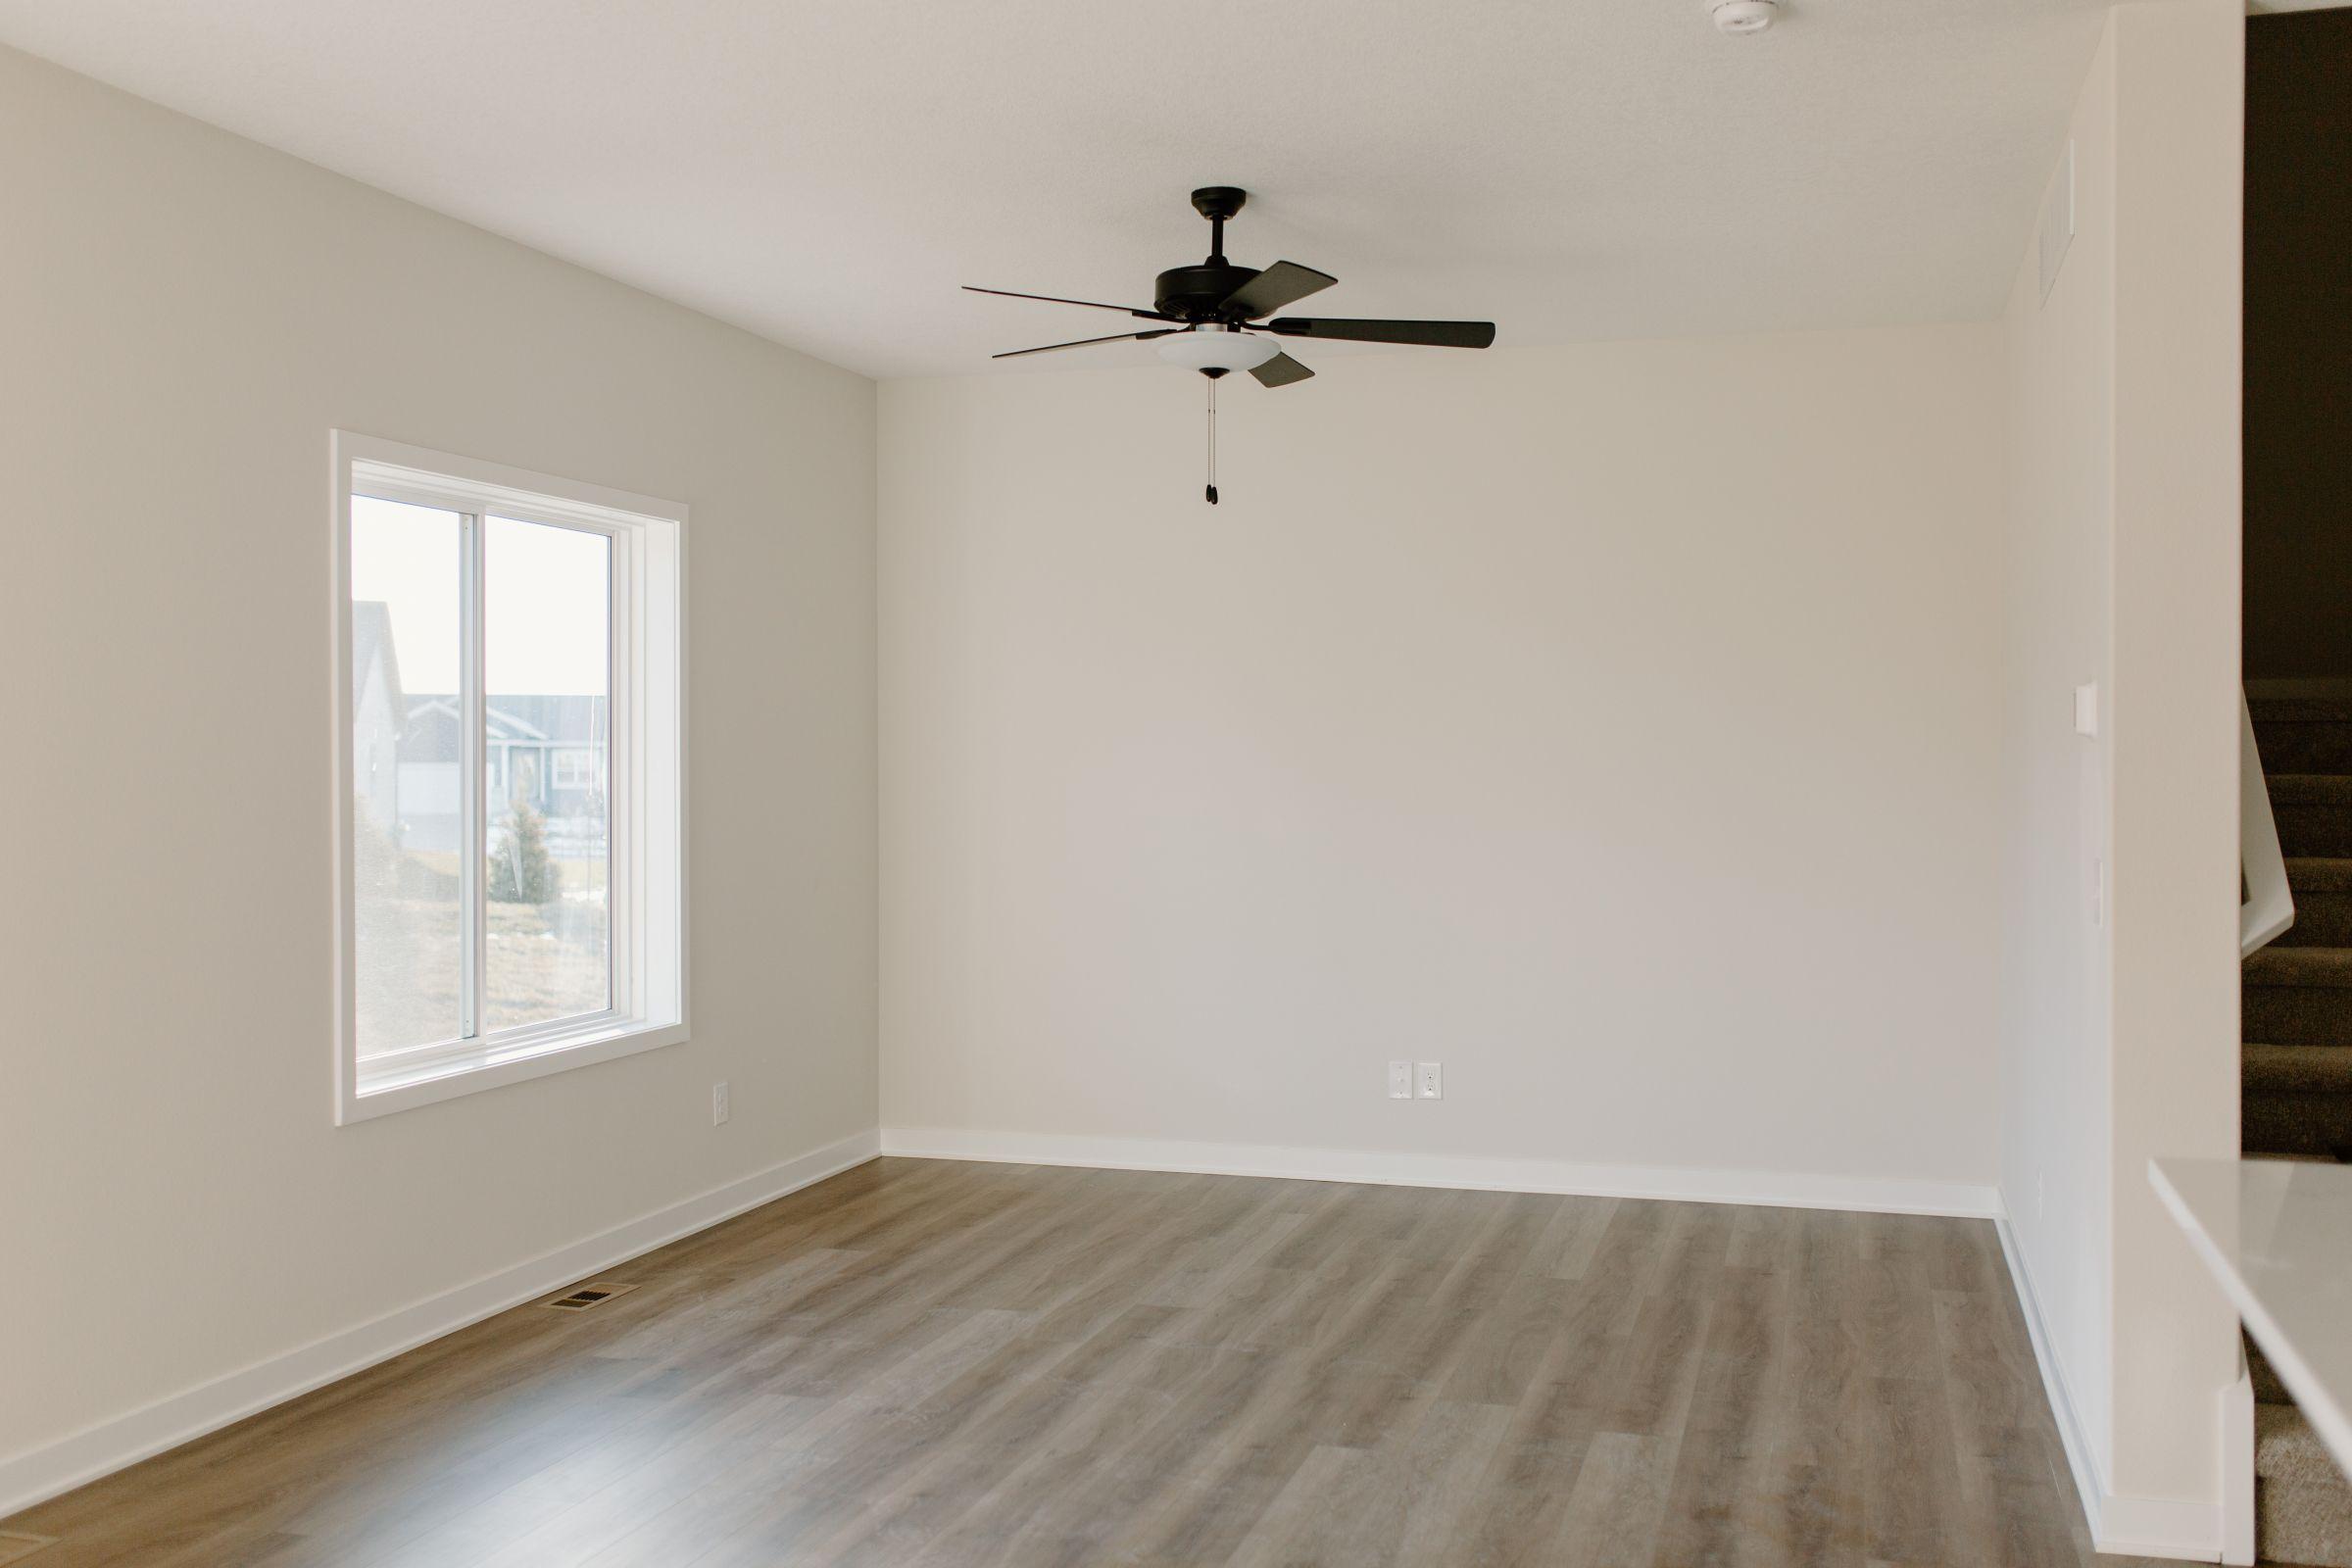 residential-warren-county-iowa-0-acres-listing-number-15365-6-2021-02-17-220740.jpg